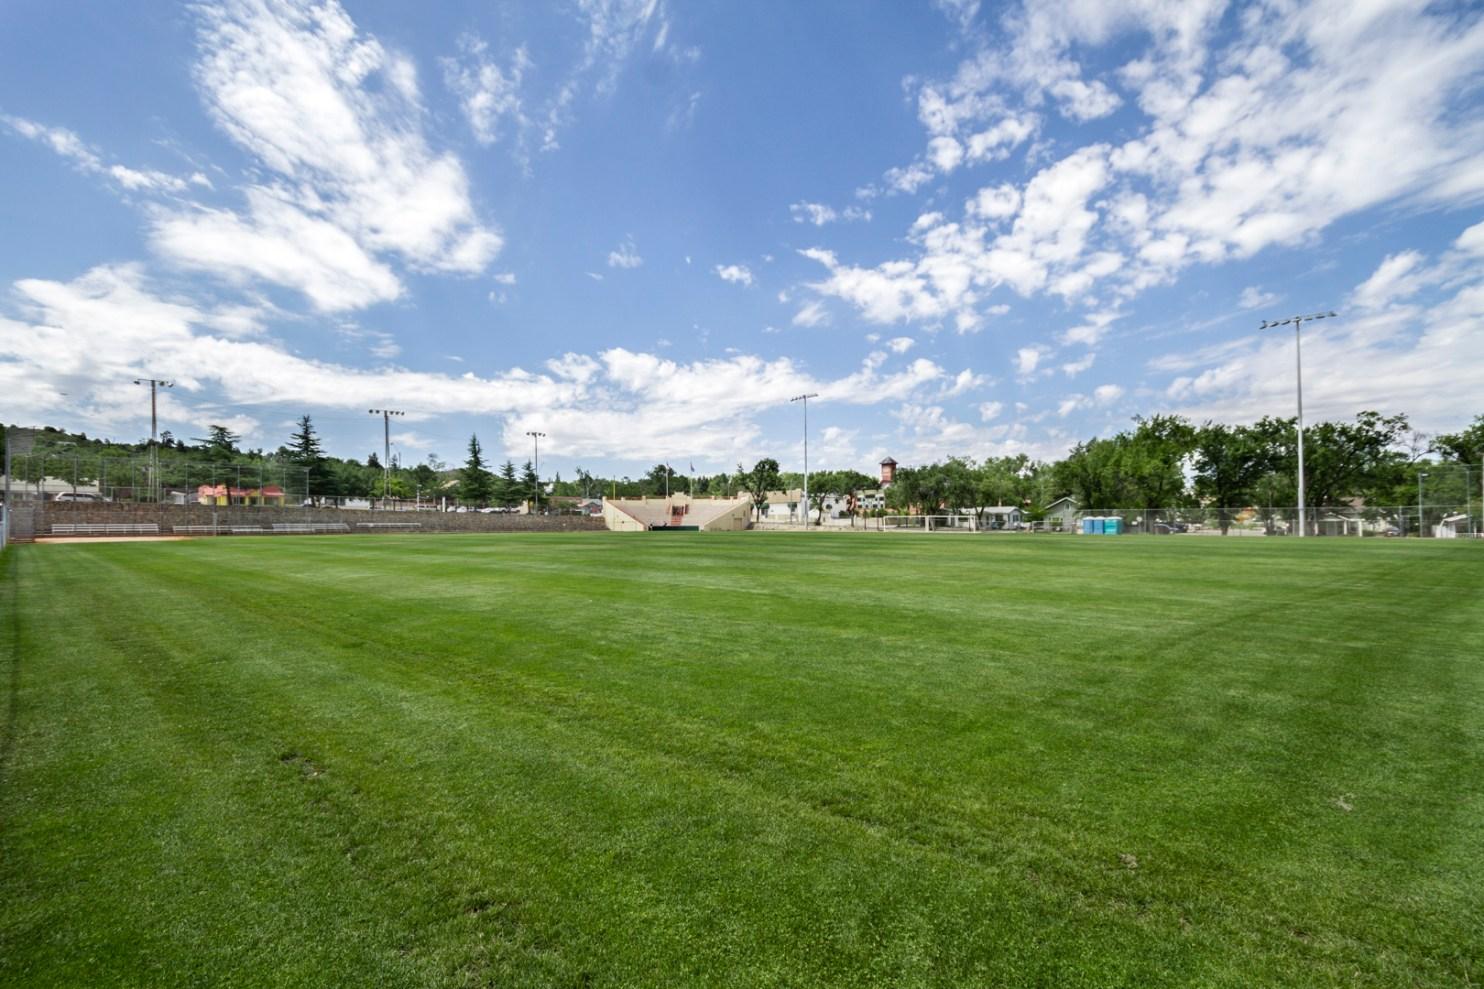 visit prescott, prescott parks, ball field in prescott, public park